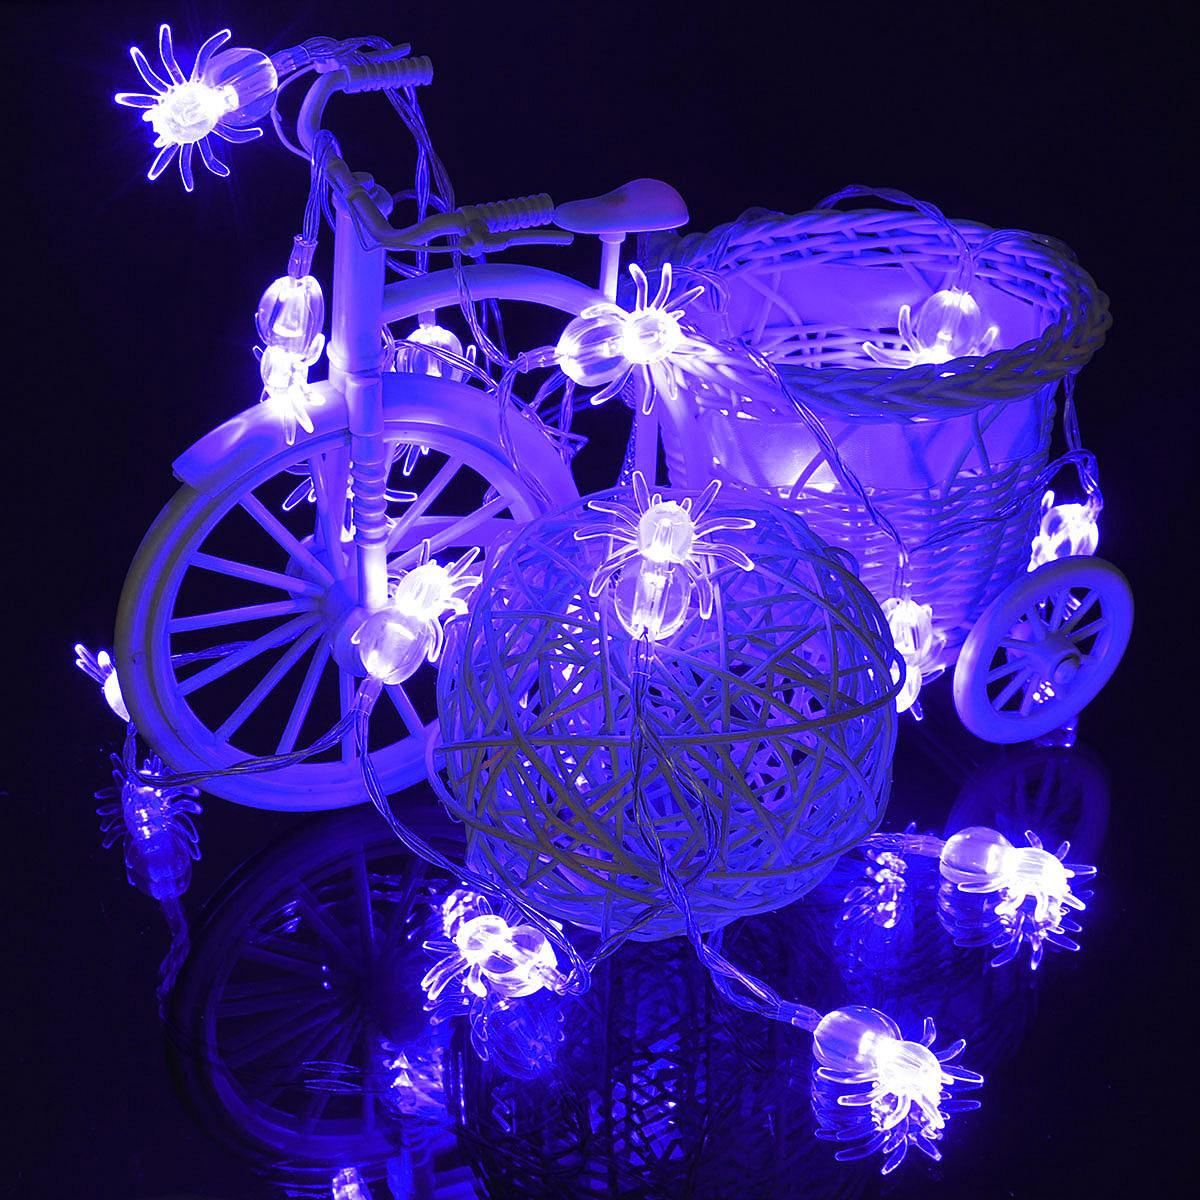 20 Blue LED Spider Light Halloween Party Decration Lights